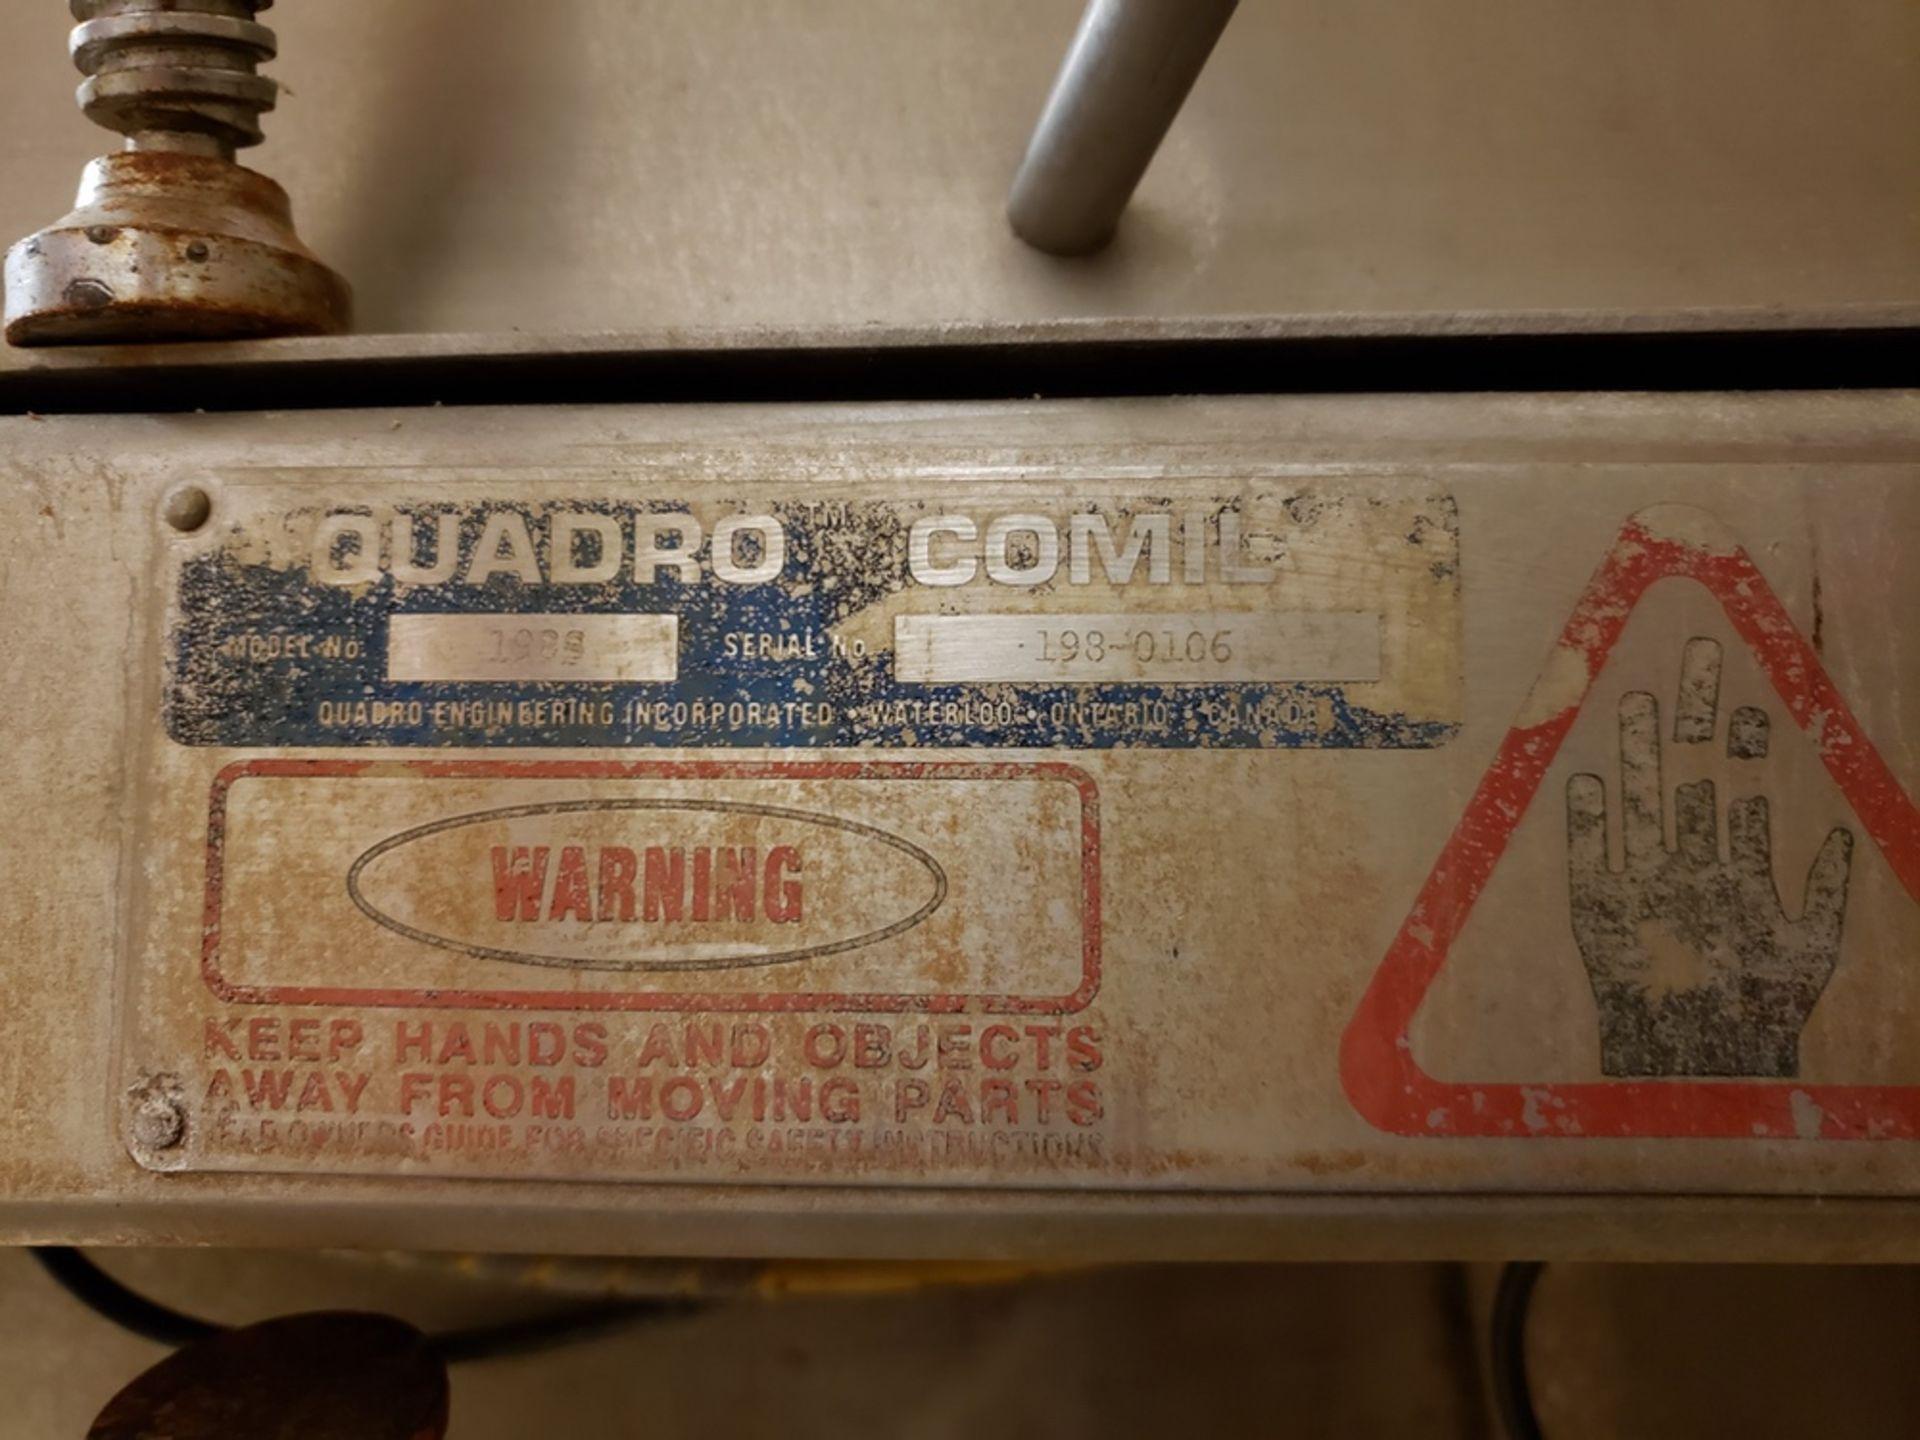 Lot 184 - Quadro Comil, M# 198S, S/N 198-0106, W/ Feed Auger | Rig Fee: $600